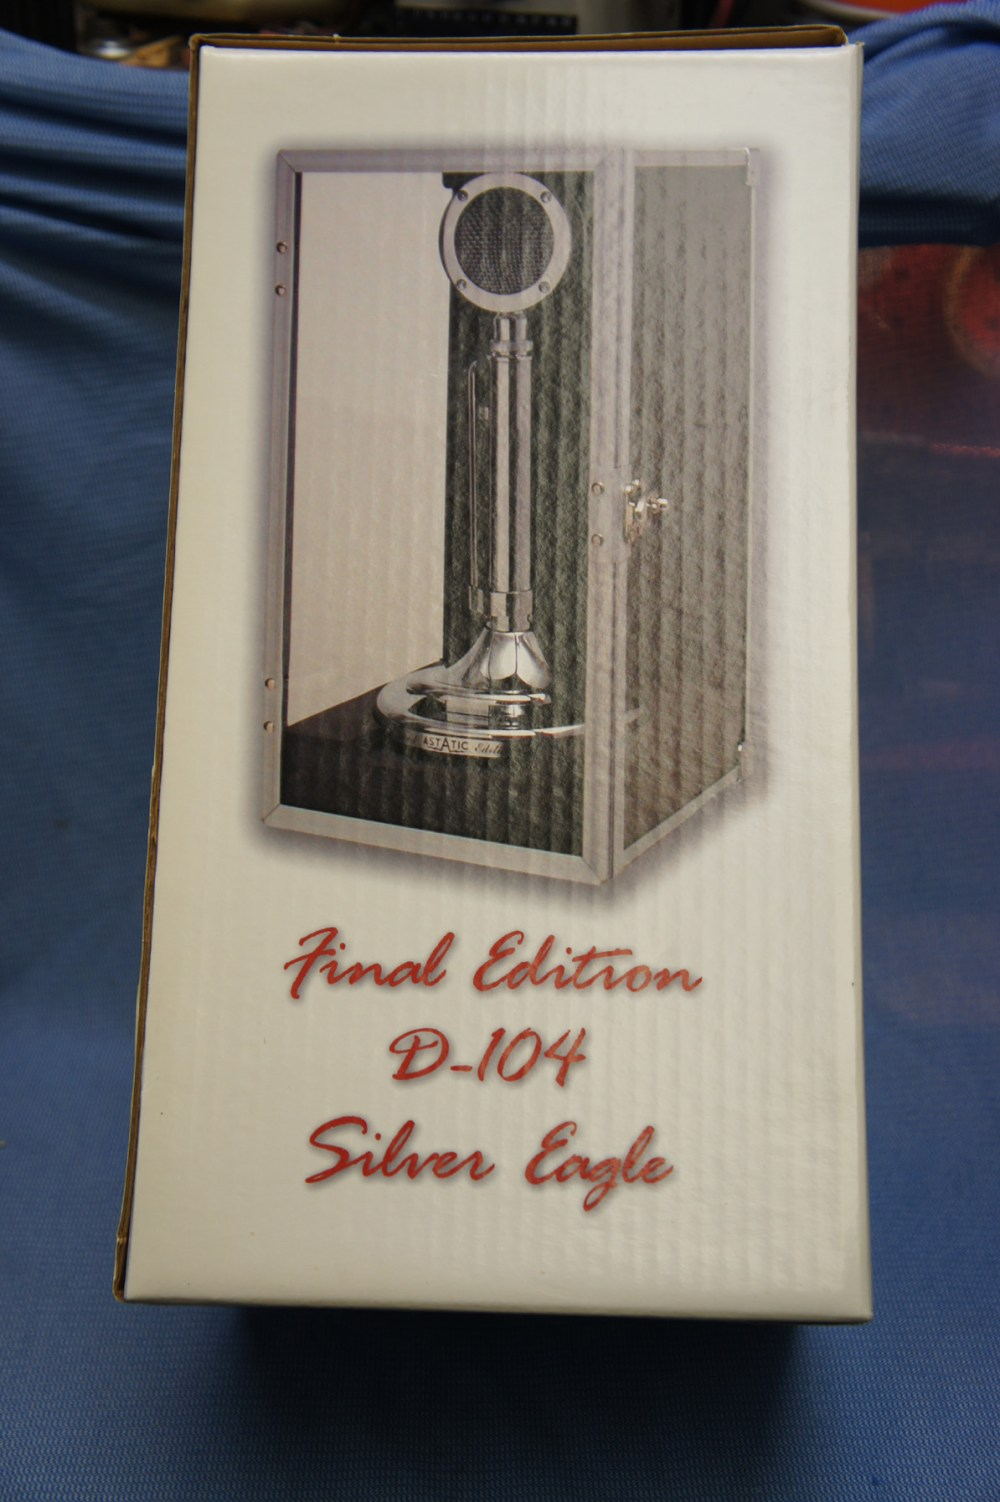 medium resolution of  http www rrcom com sales camera jpg astatic final edition silver eagle